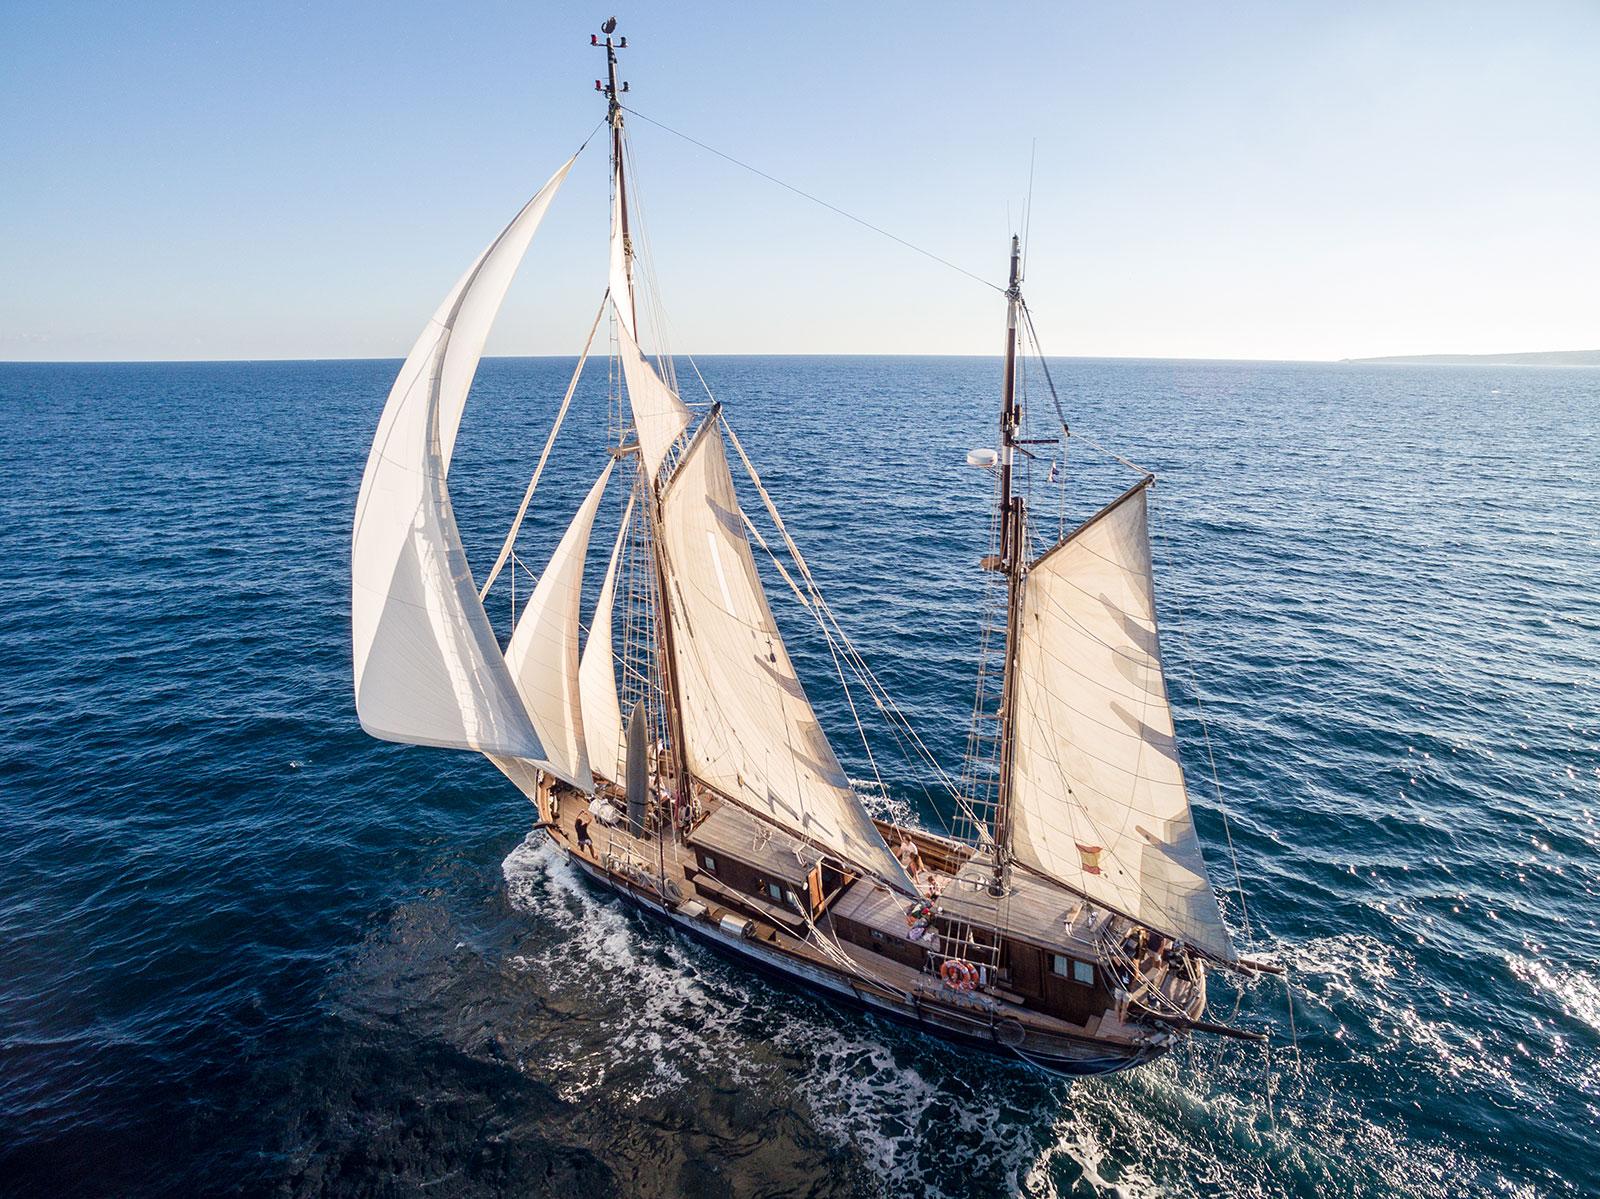 Mallorca-segelschiff-charter-mallorca-historisches-segelboot-mieten-mallorca-8